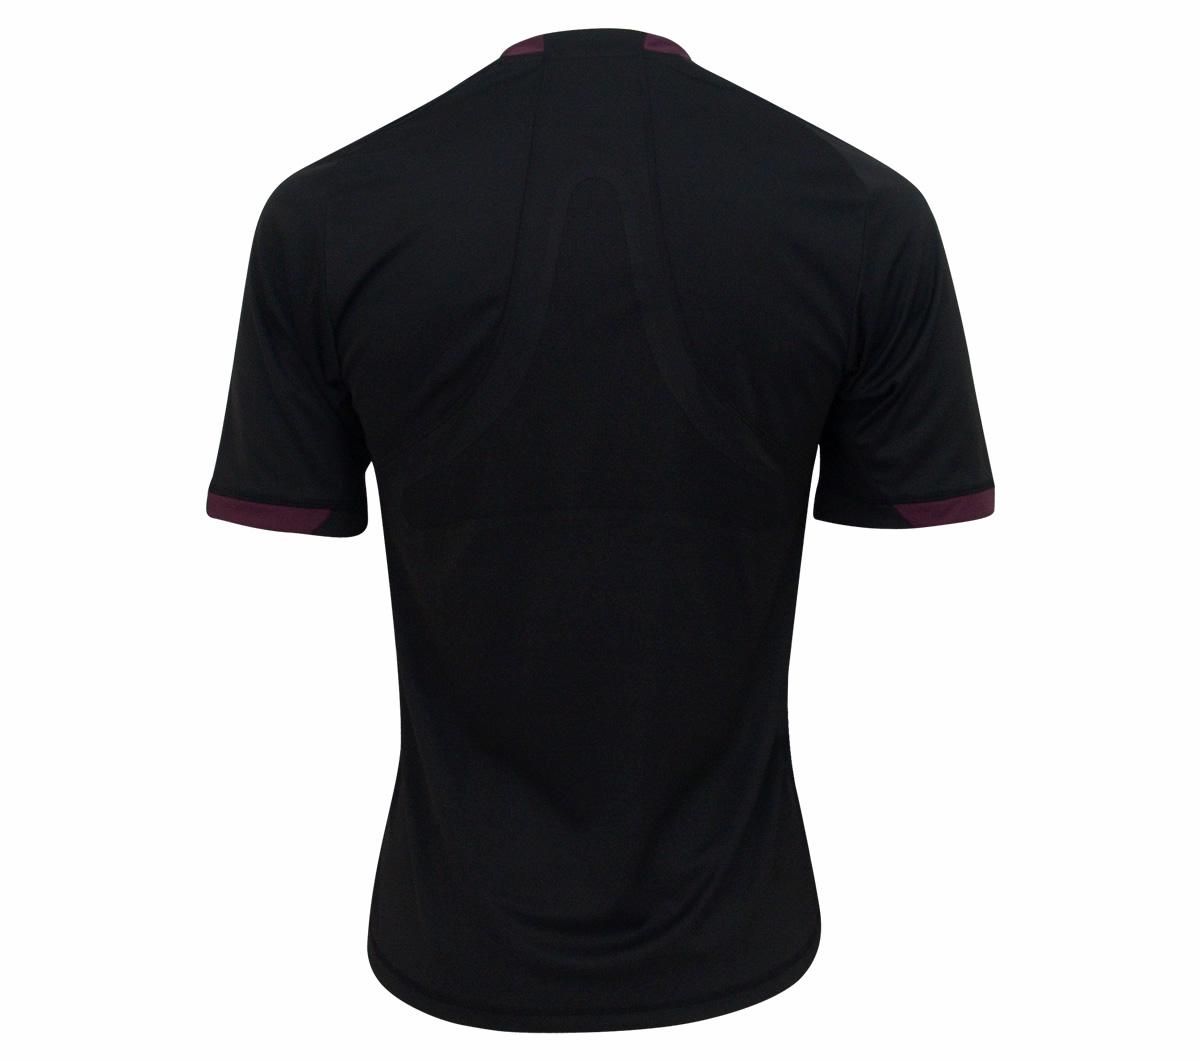 Camisa Árbitro Adidas Preta - Mundo do Futebol 9962bc9db3a95